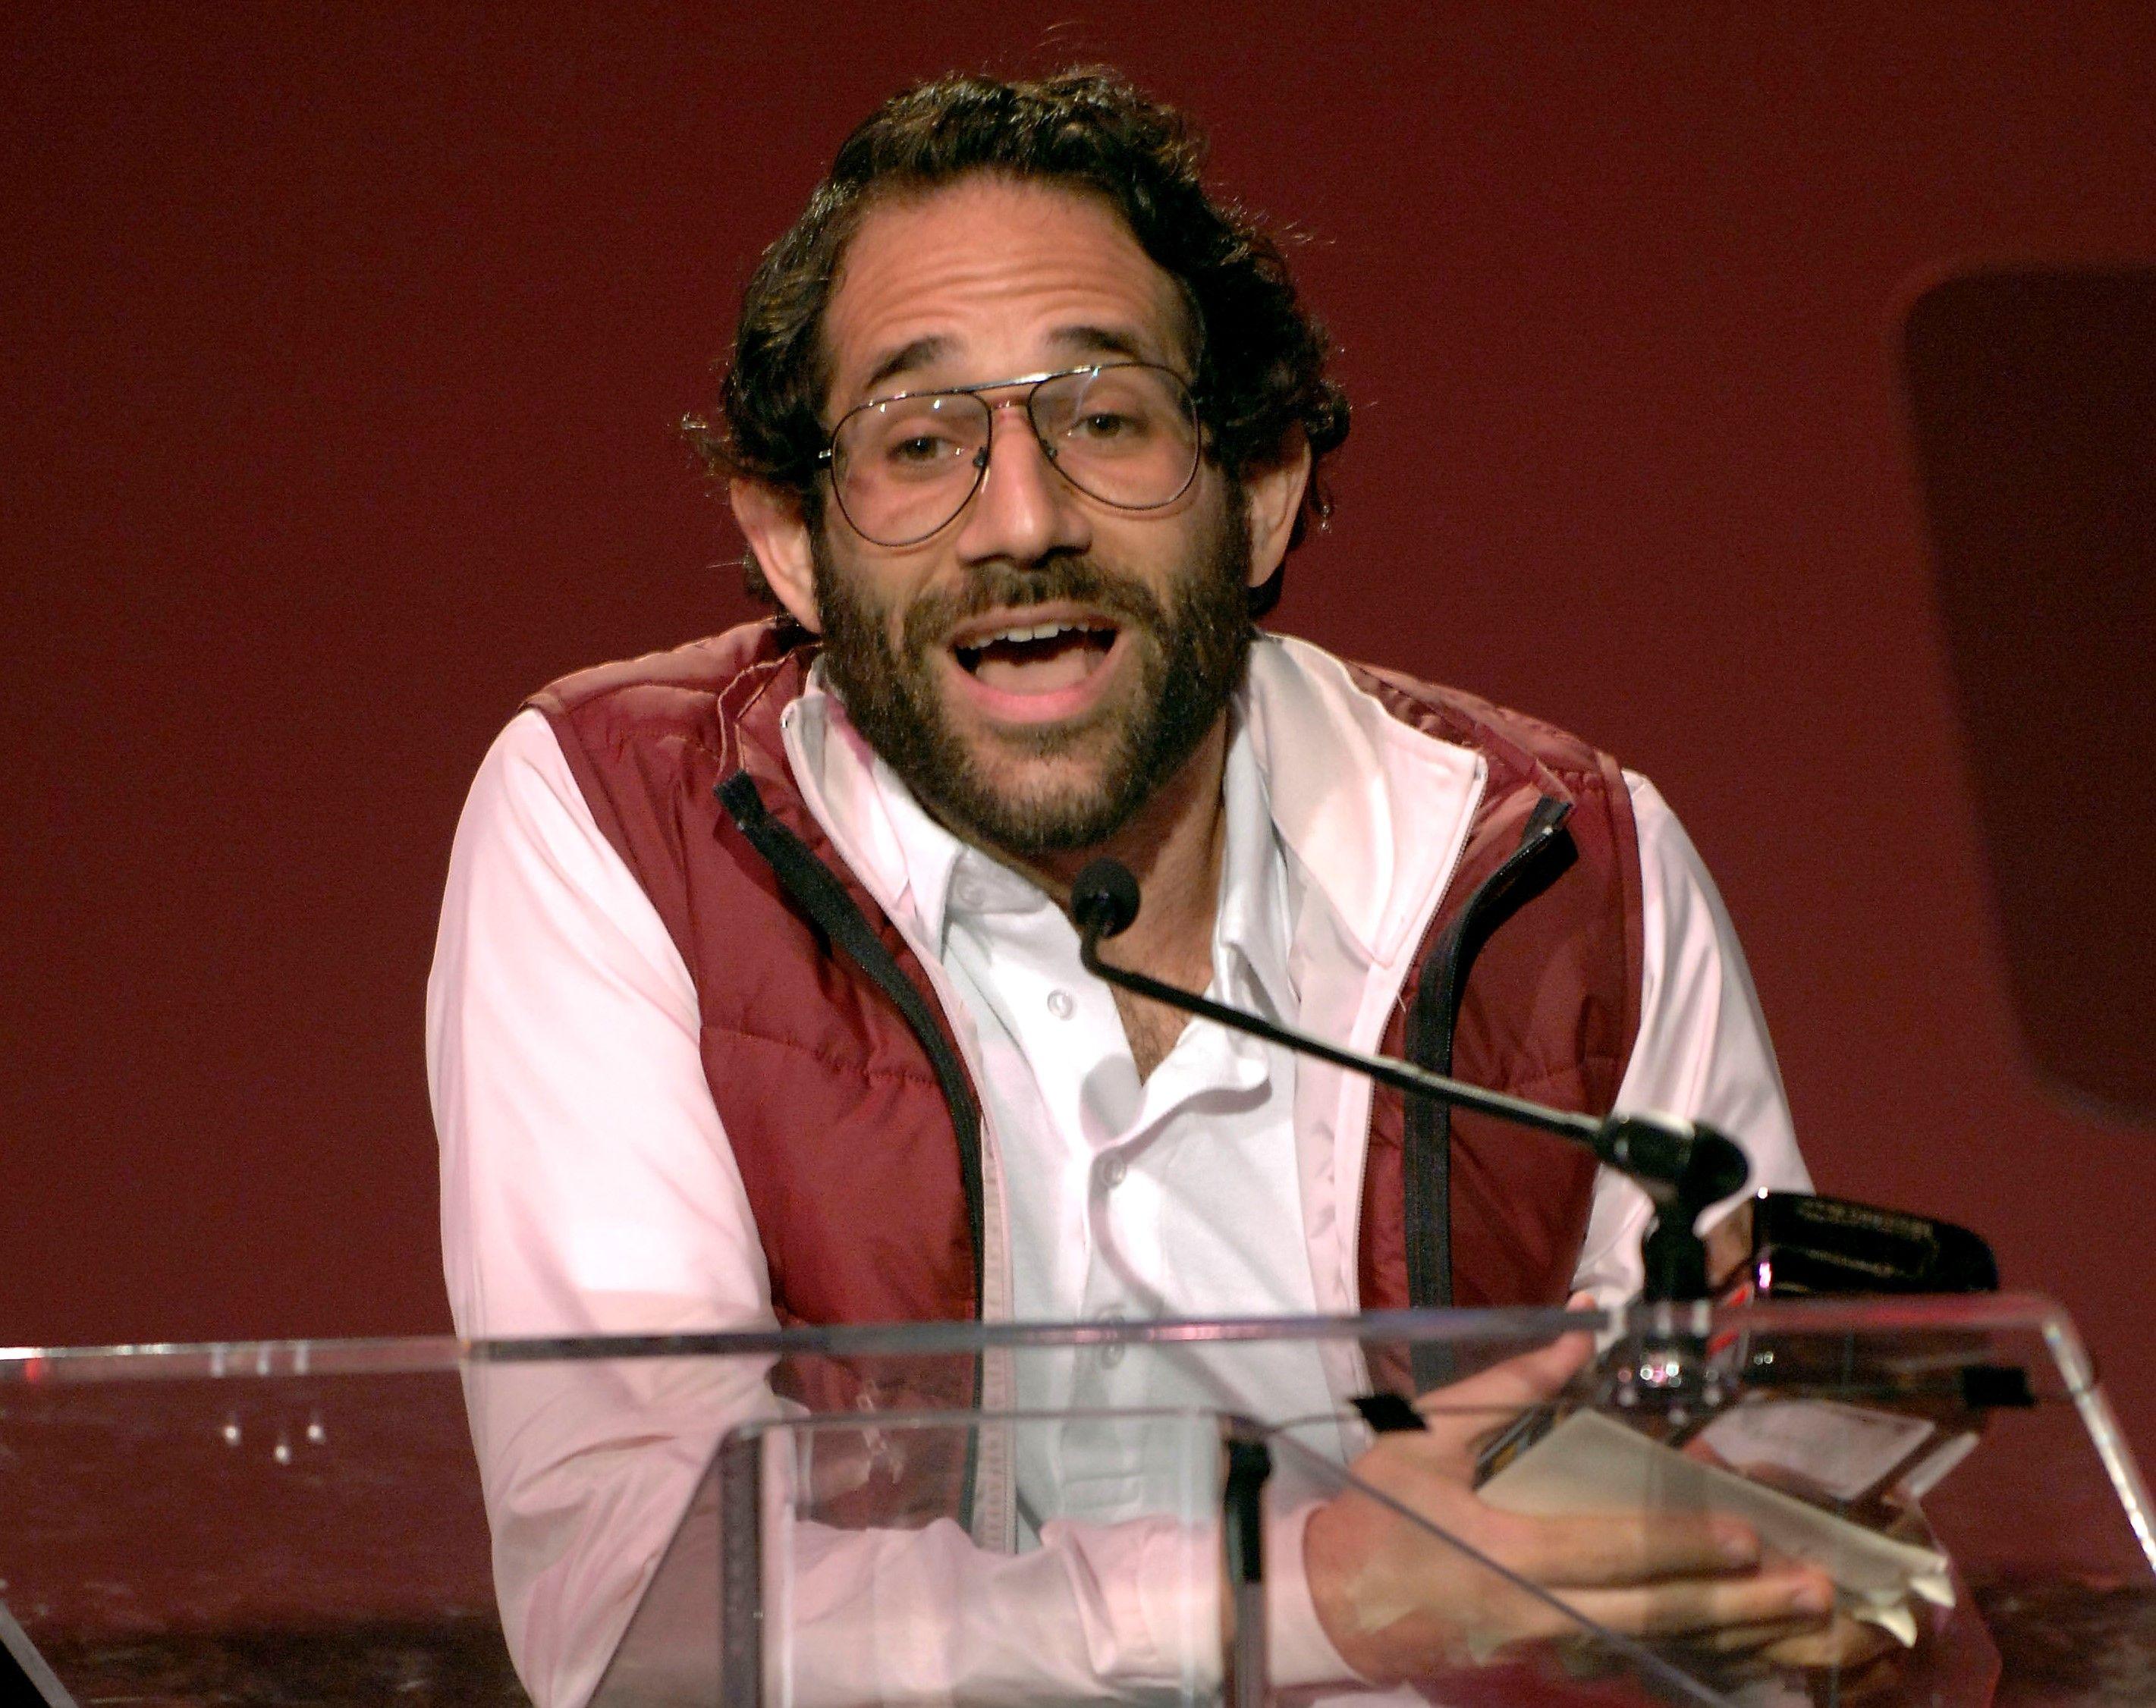 Former American Apparel CEO Dov Charney